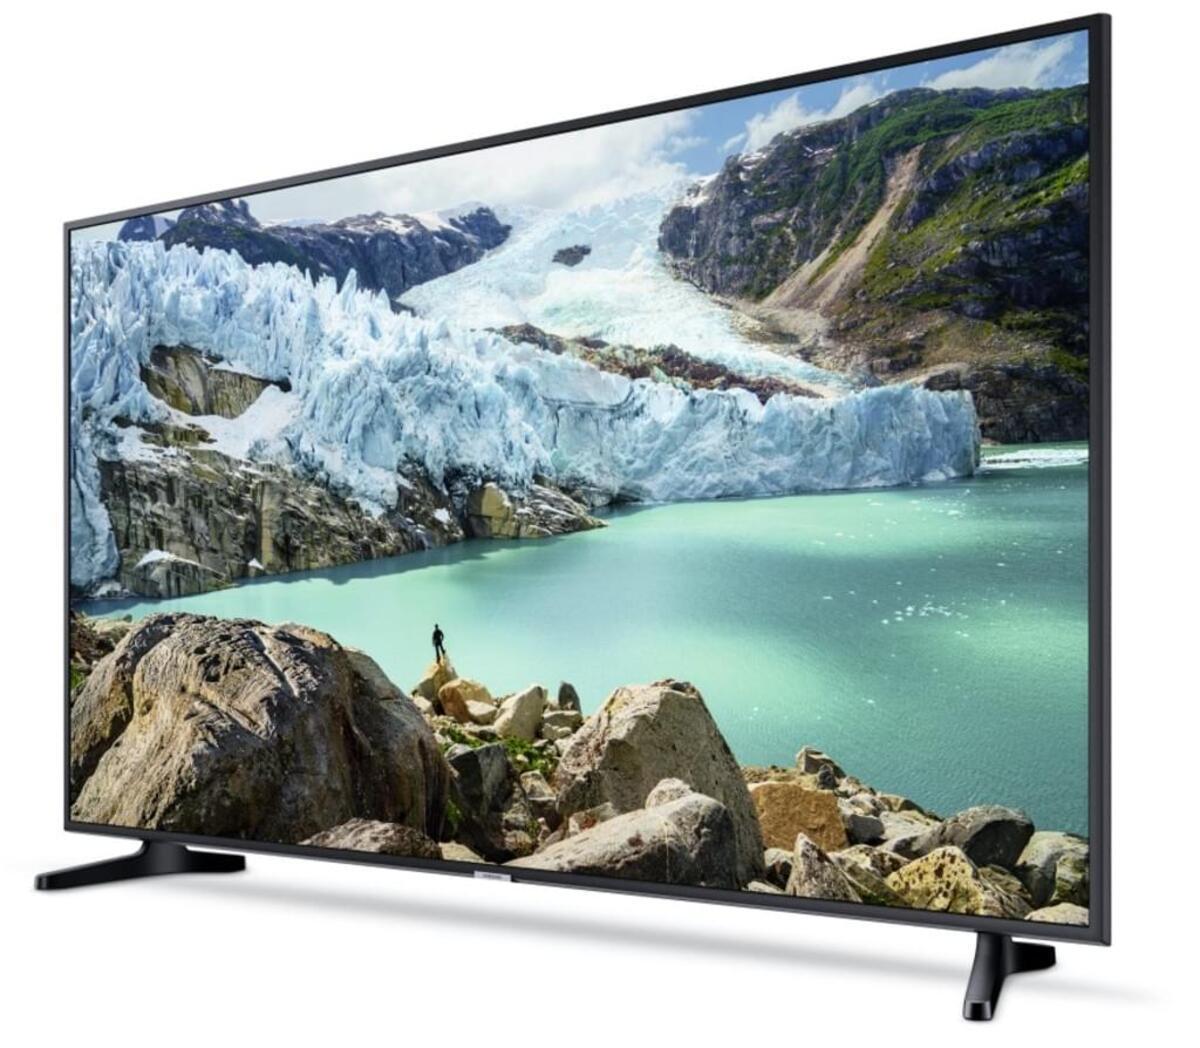 Bild 2 von Samsung 4K Ultra HD LED 108 cm (43 Zoll) 43RU7099 Smart TV, Triple Tuner, HDR10+